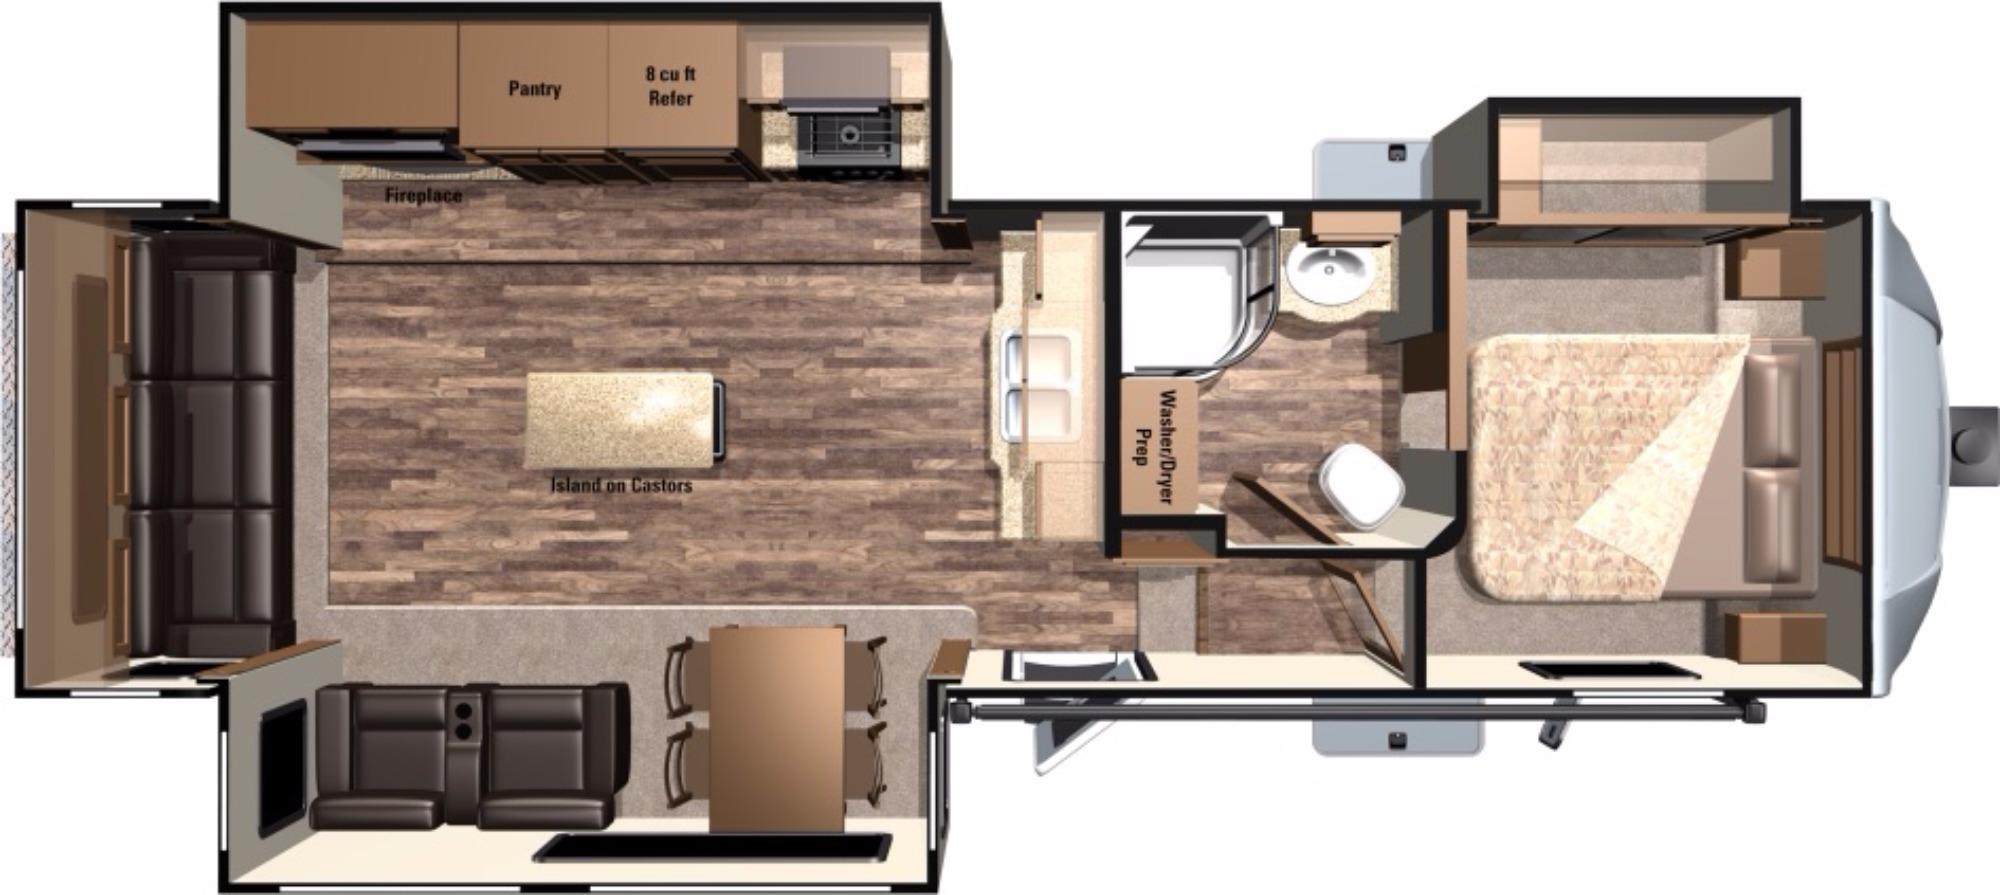 View Floor Plan for 2017 HIGHLAND RIDGE LIGHT 319RLS